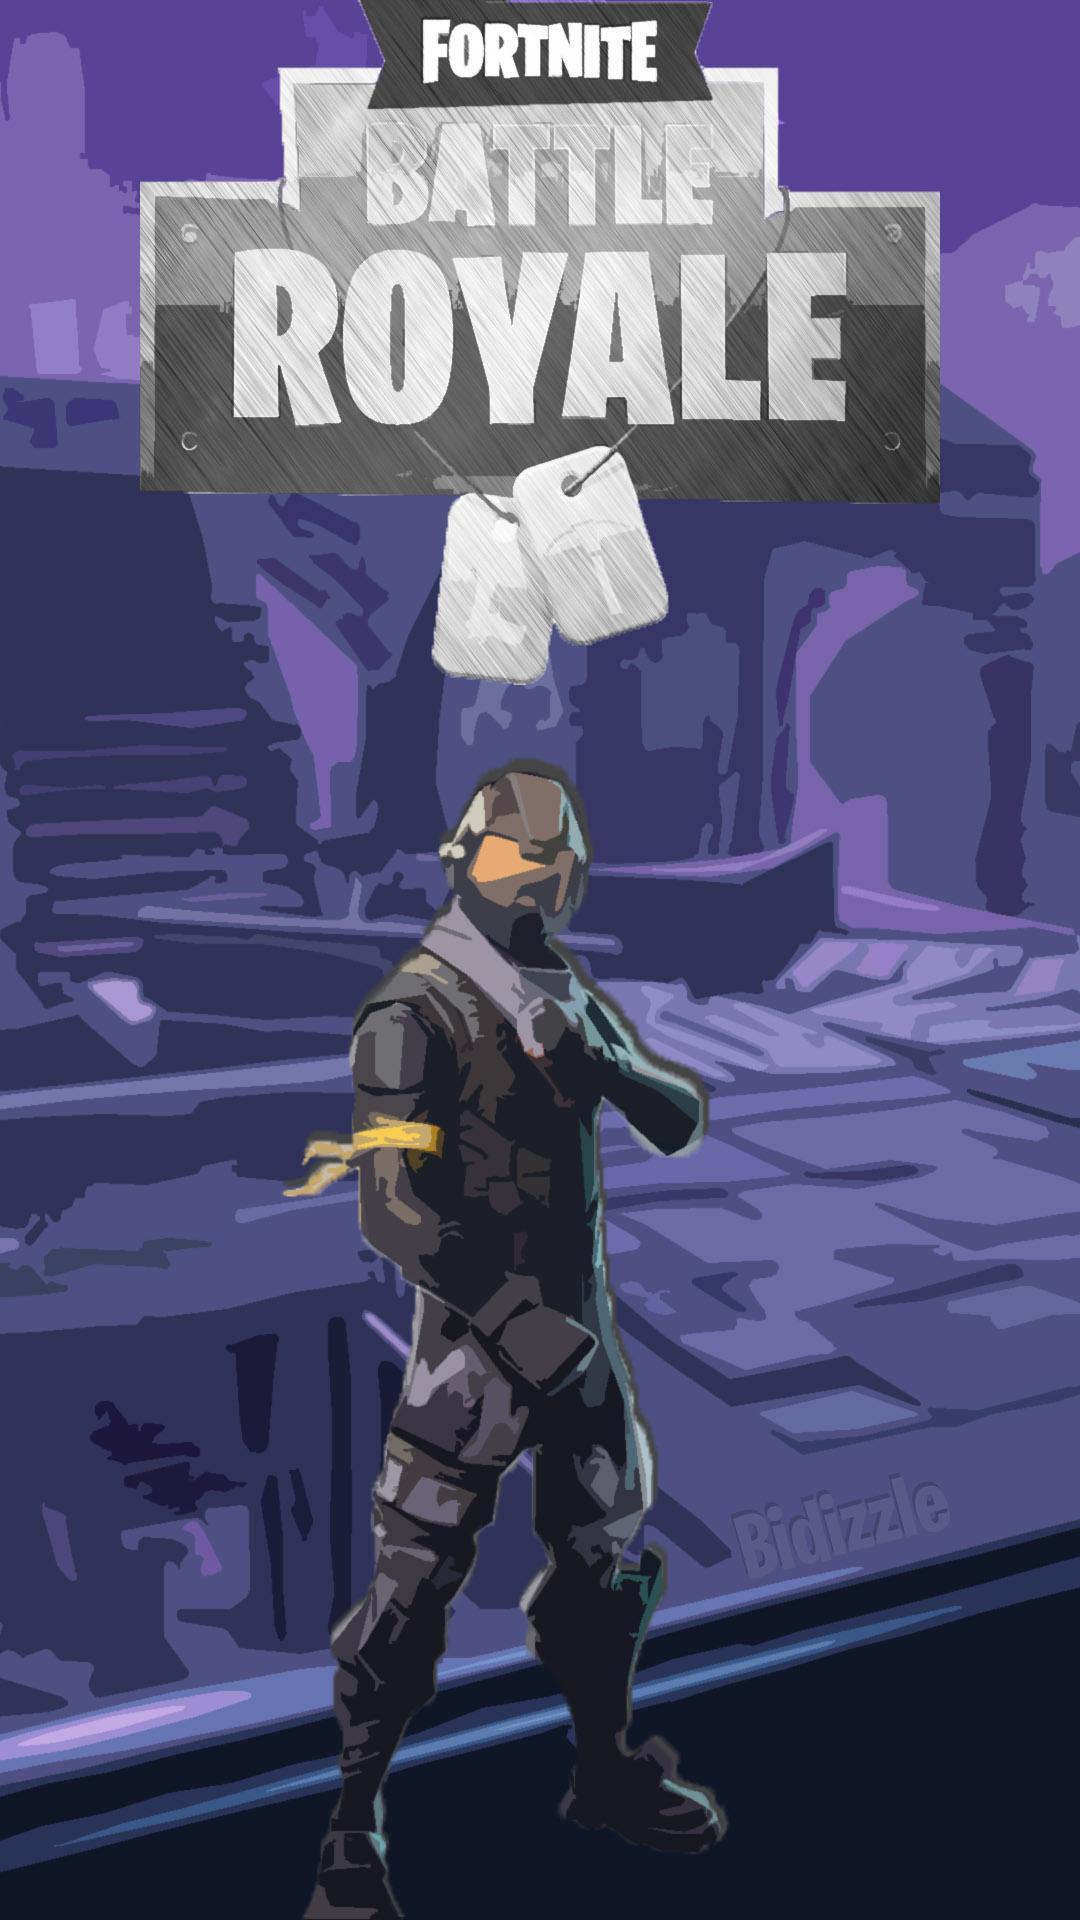 Rogue Agent Fortnite Wallpapers Wallpaper Cave